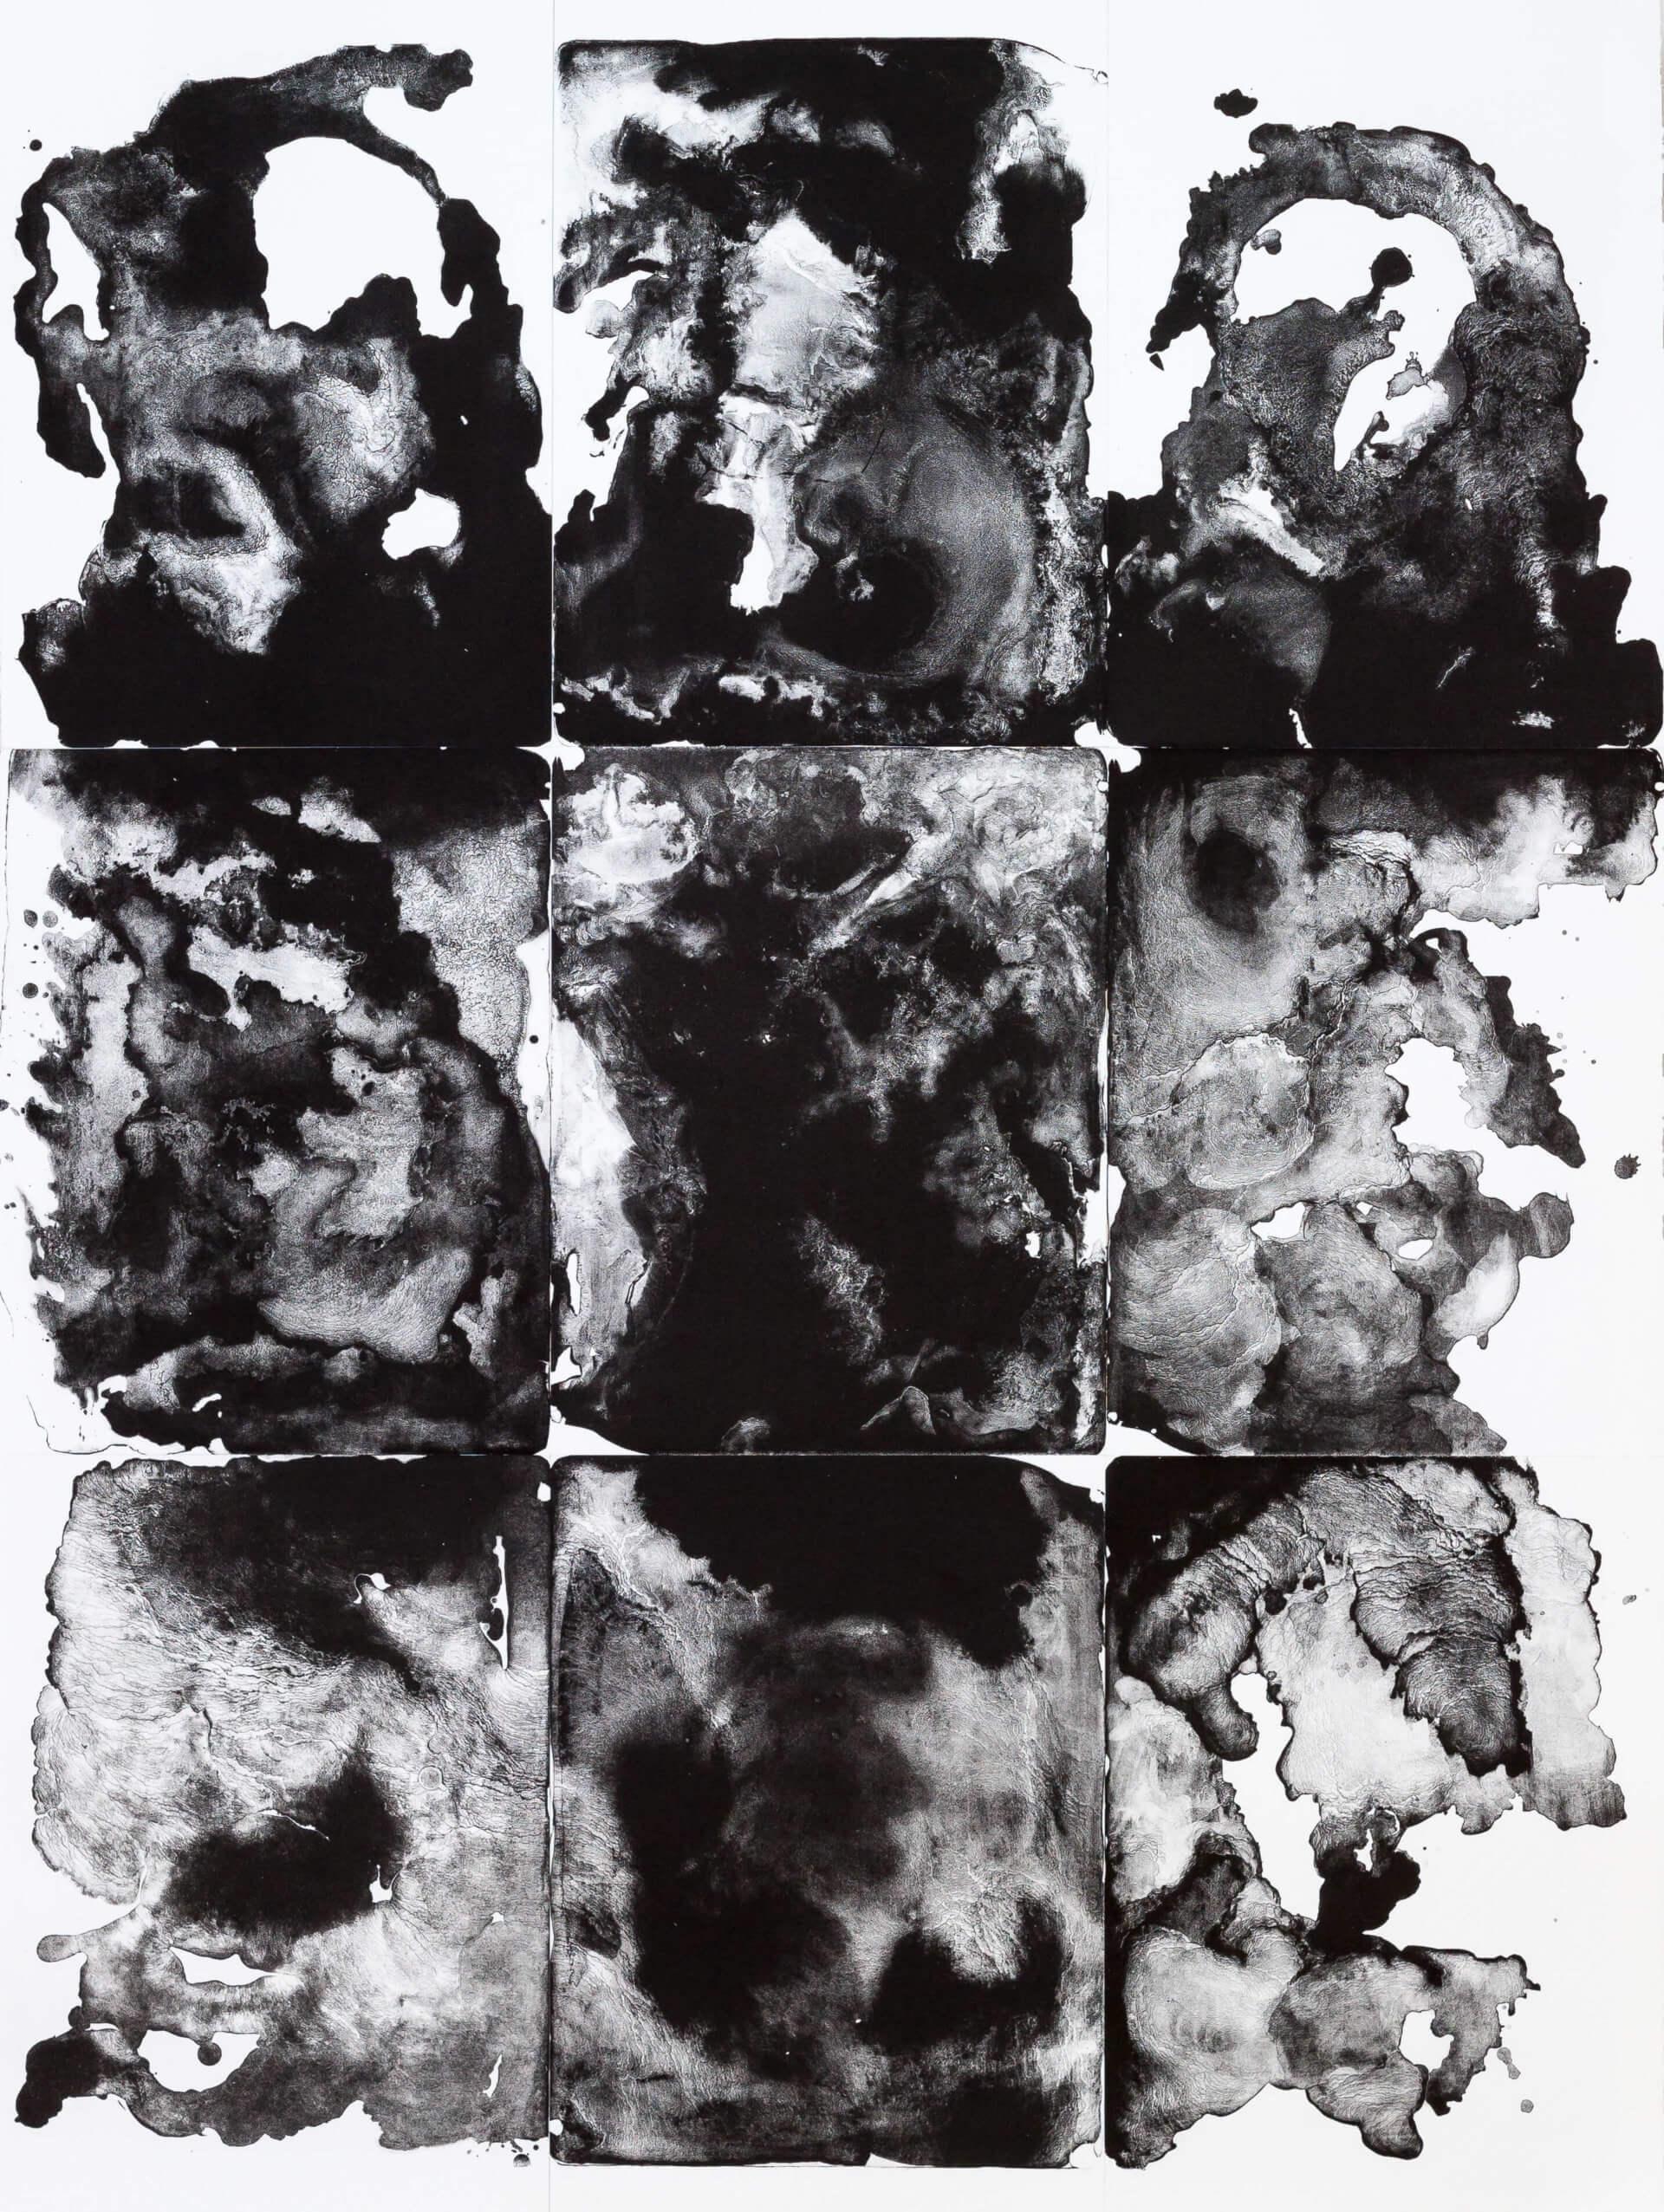 Katharina Albers, organism (e), 2016, Lithographie 9-teilig auf Büttenpapier, Unikat, 153,5x114,5 cm